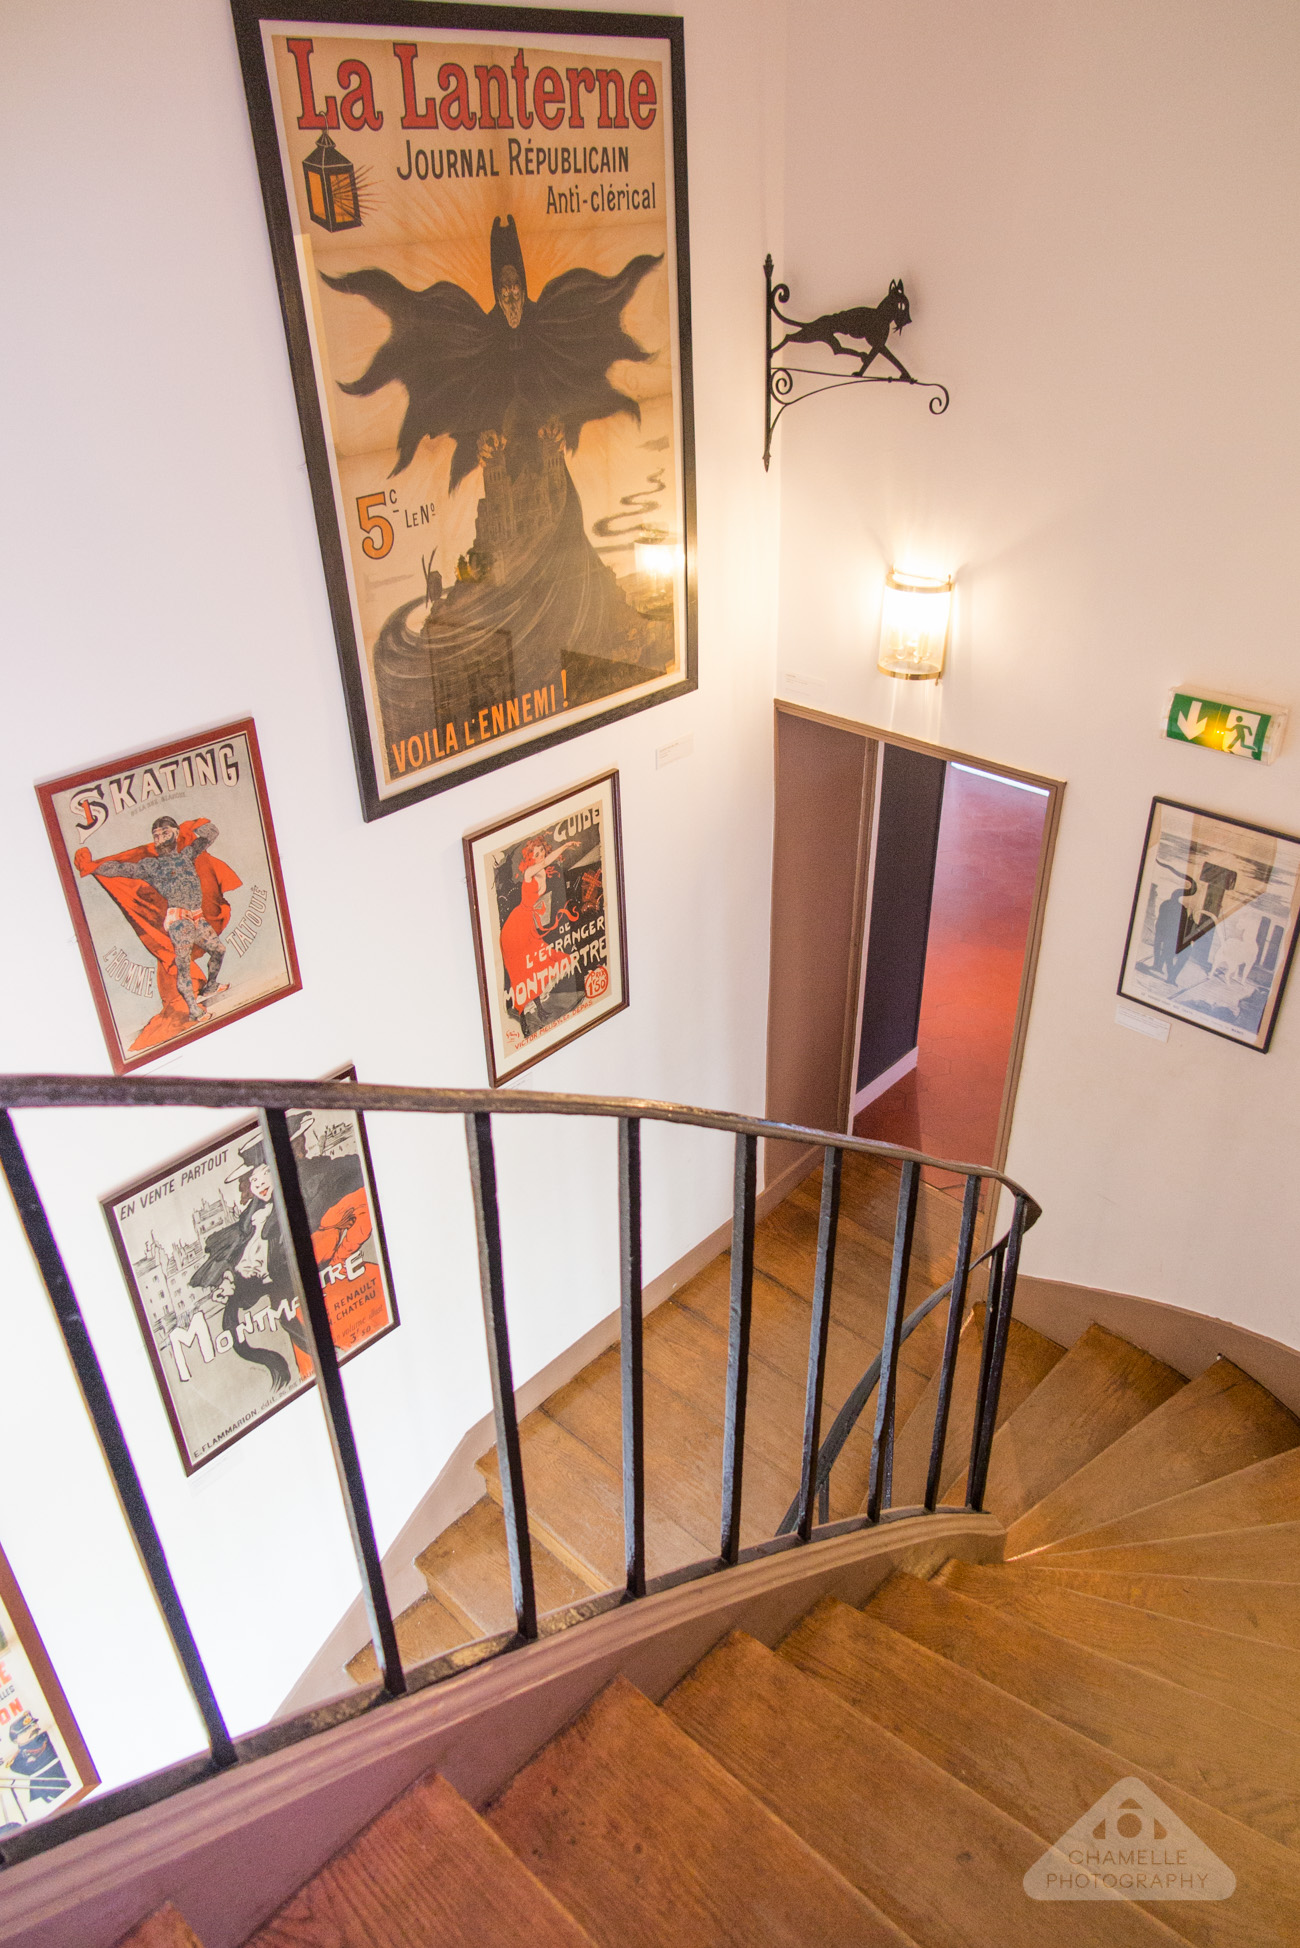 Musee Montmartre Museum film decor Paris France travel blog photography